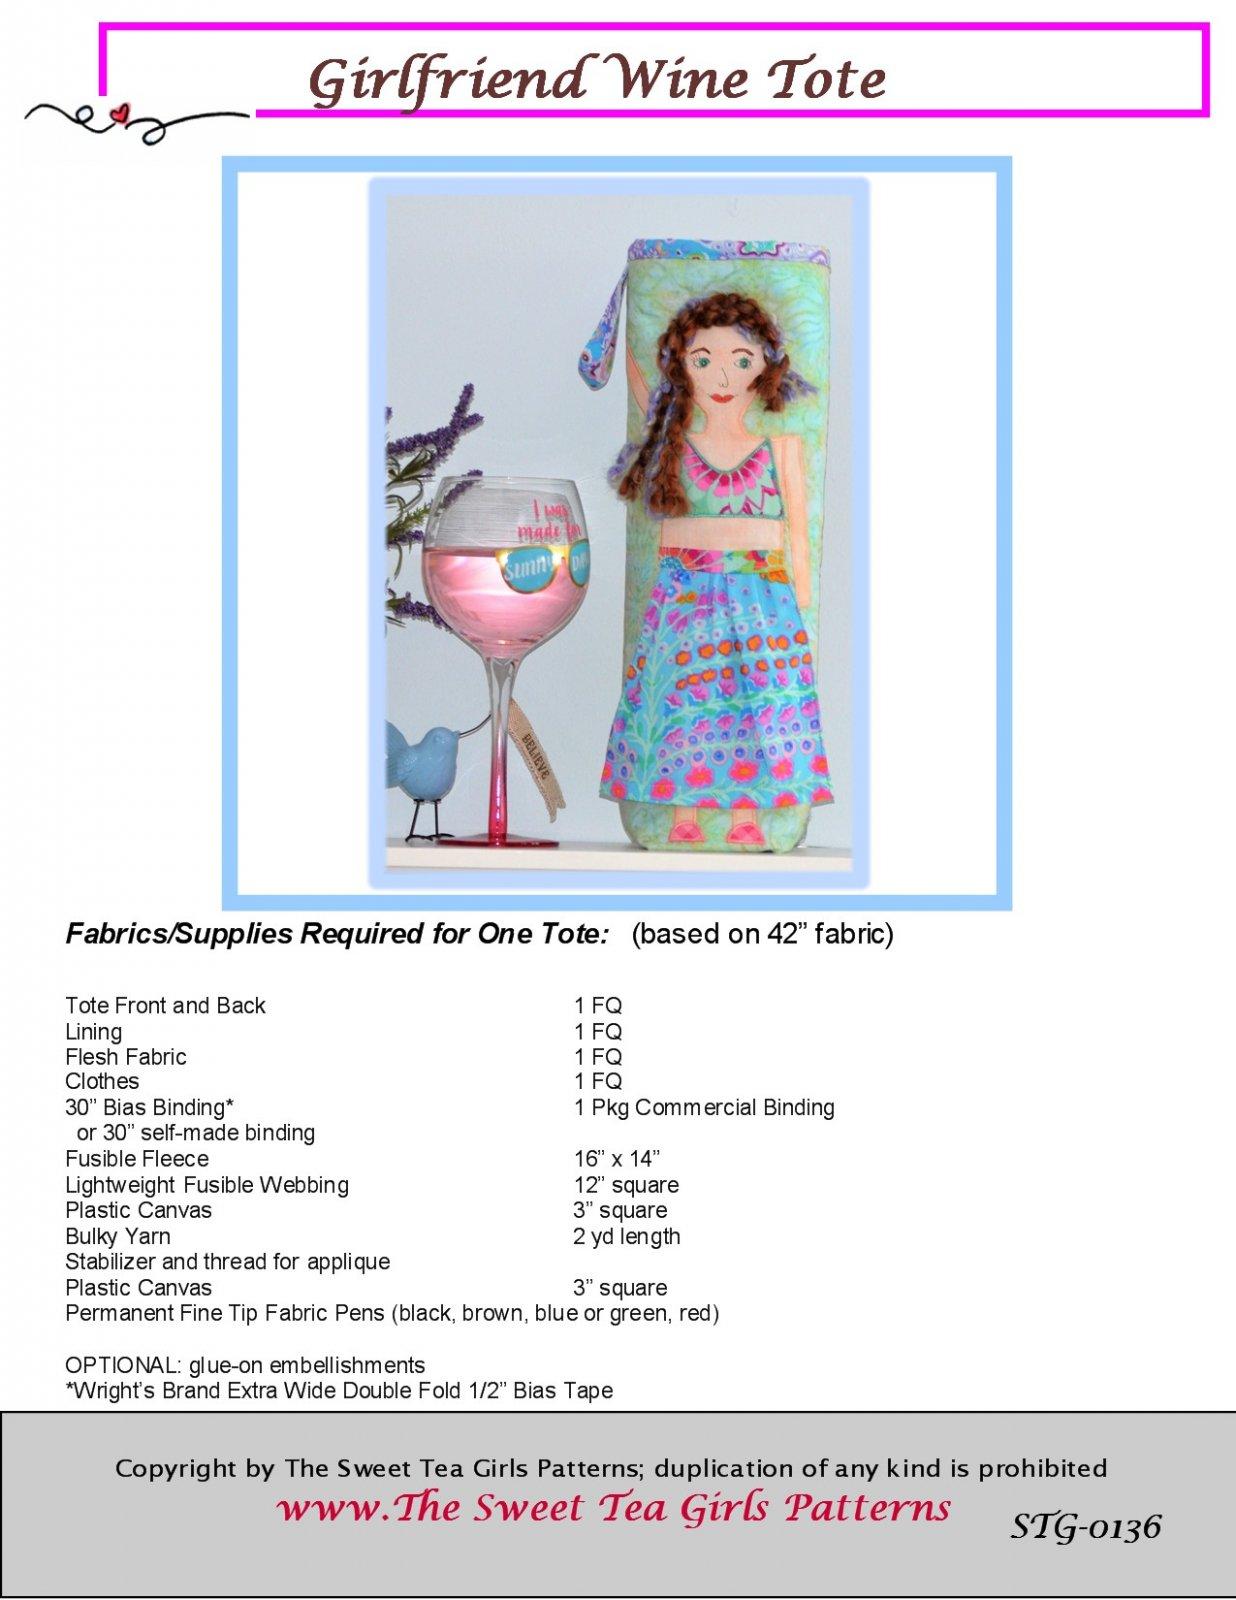 Girlfriend Wine Tote - Downloadable PDF